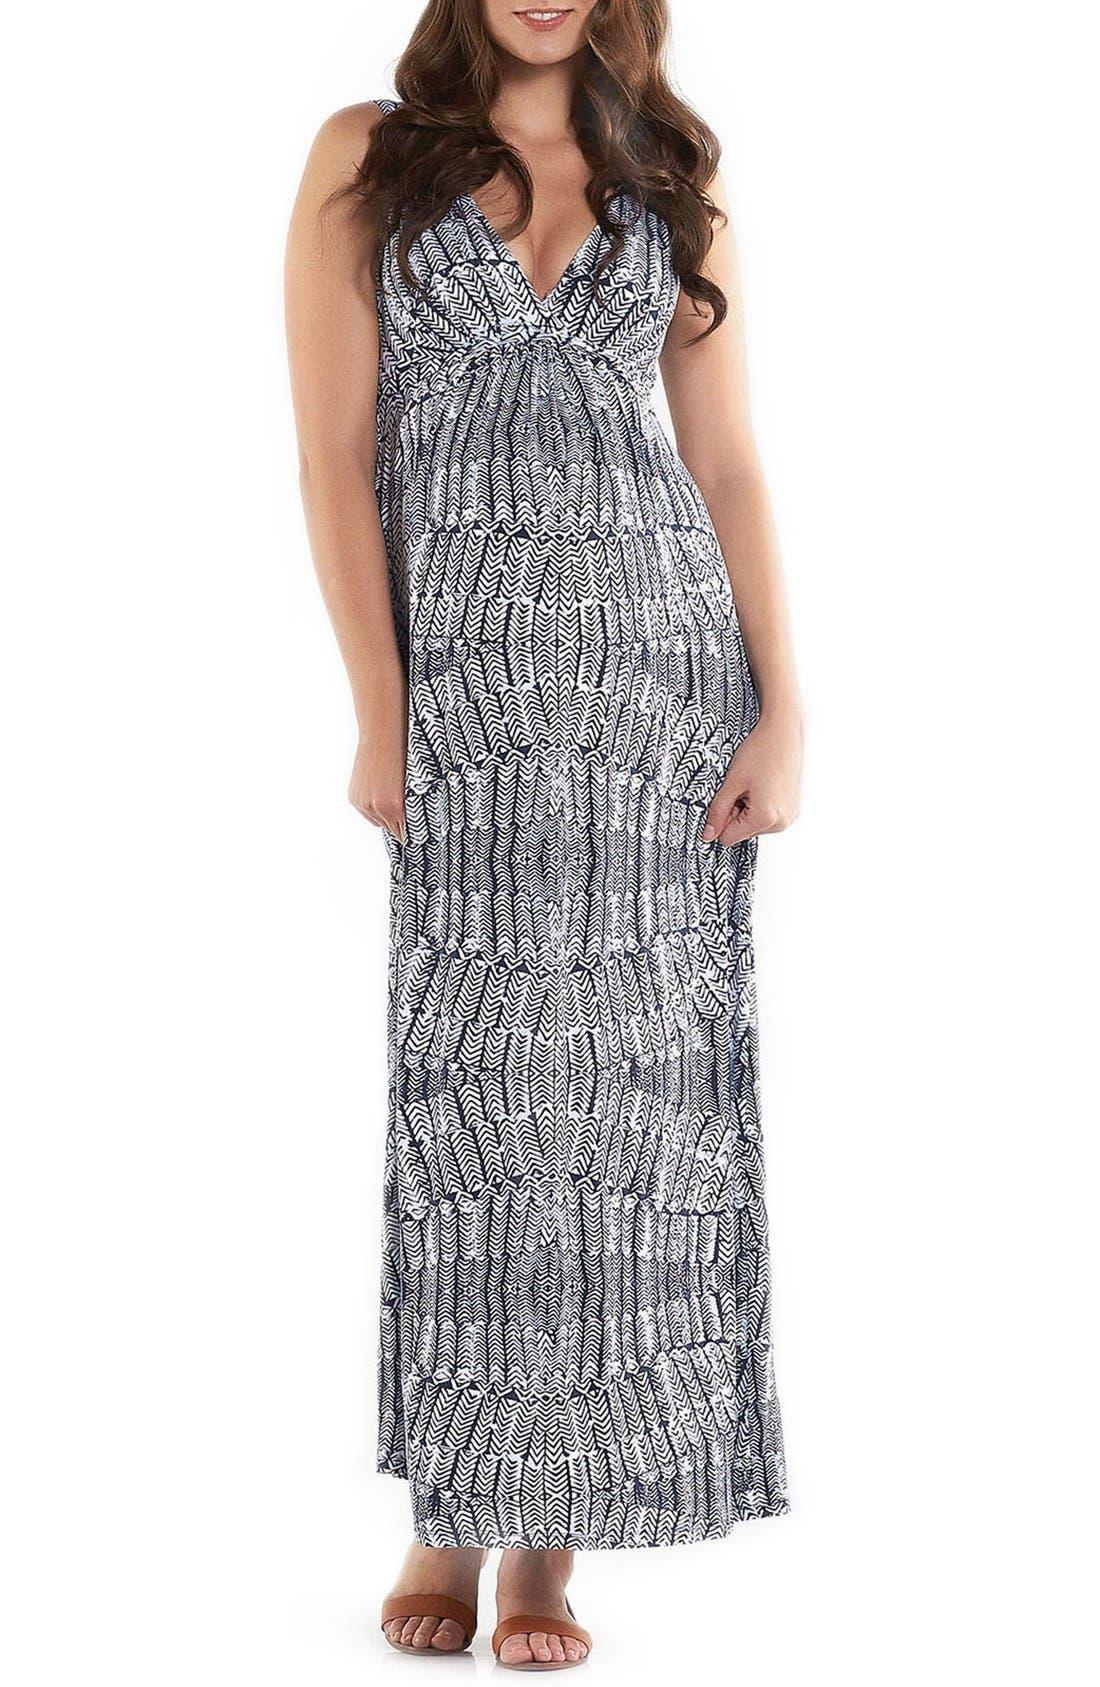 Tart Maternity 'Chloe' Maternity Maxi Dress